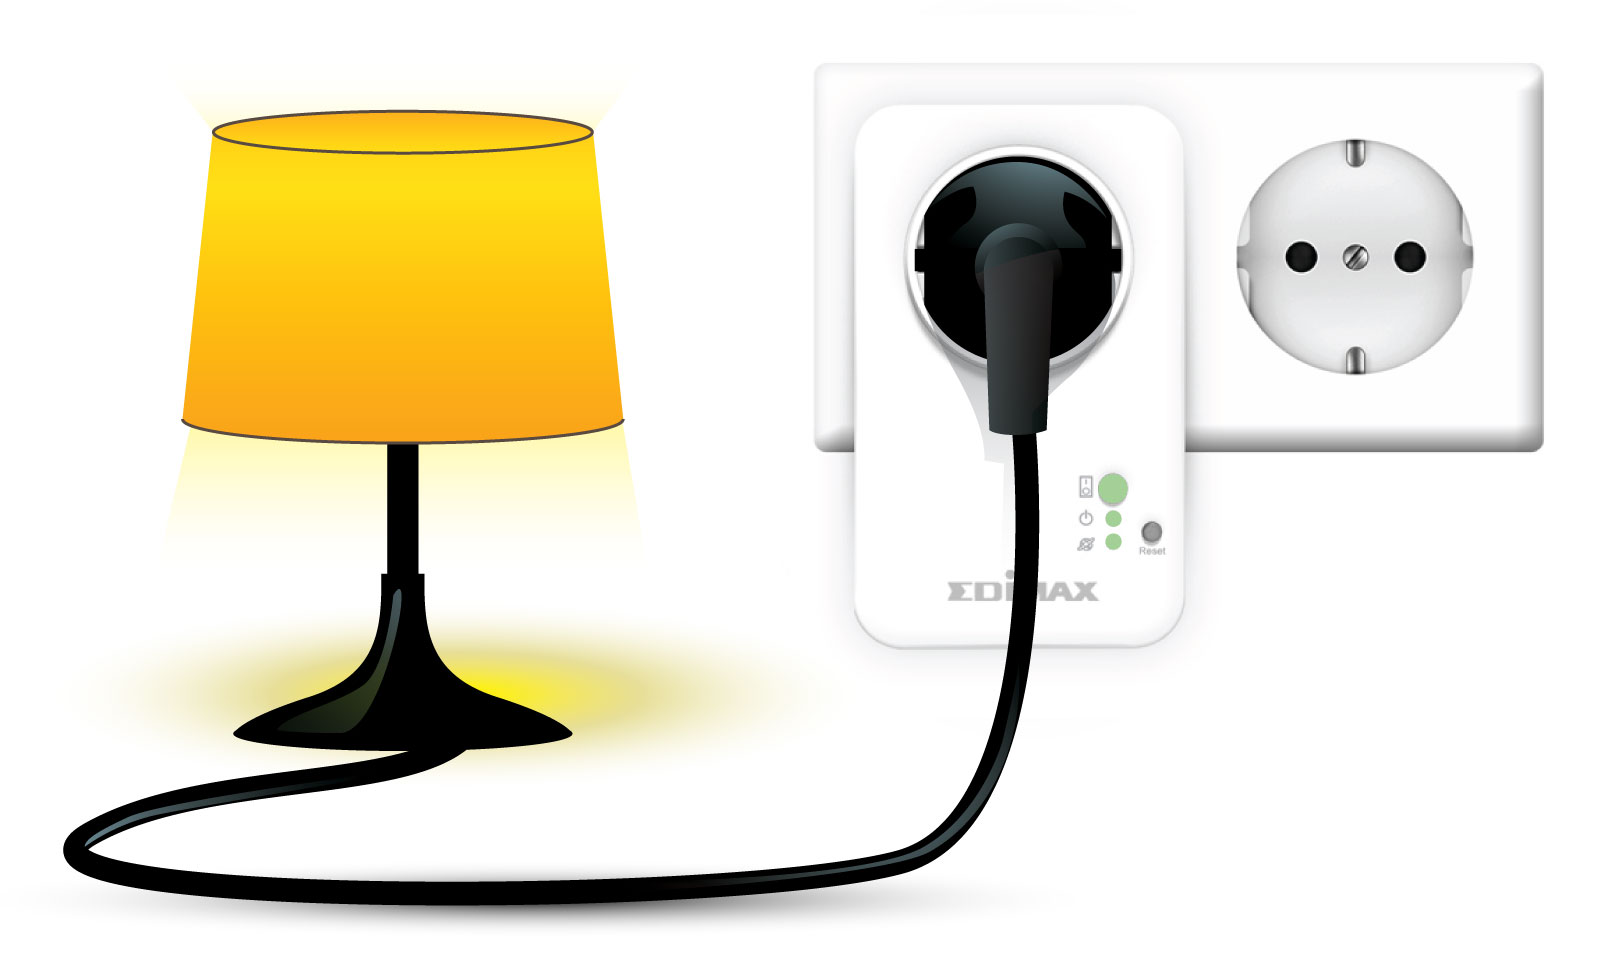 Edimax Smart Plug Switch, Intelligent Home Control, SP-1101W_application_diagram_1.jpg